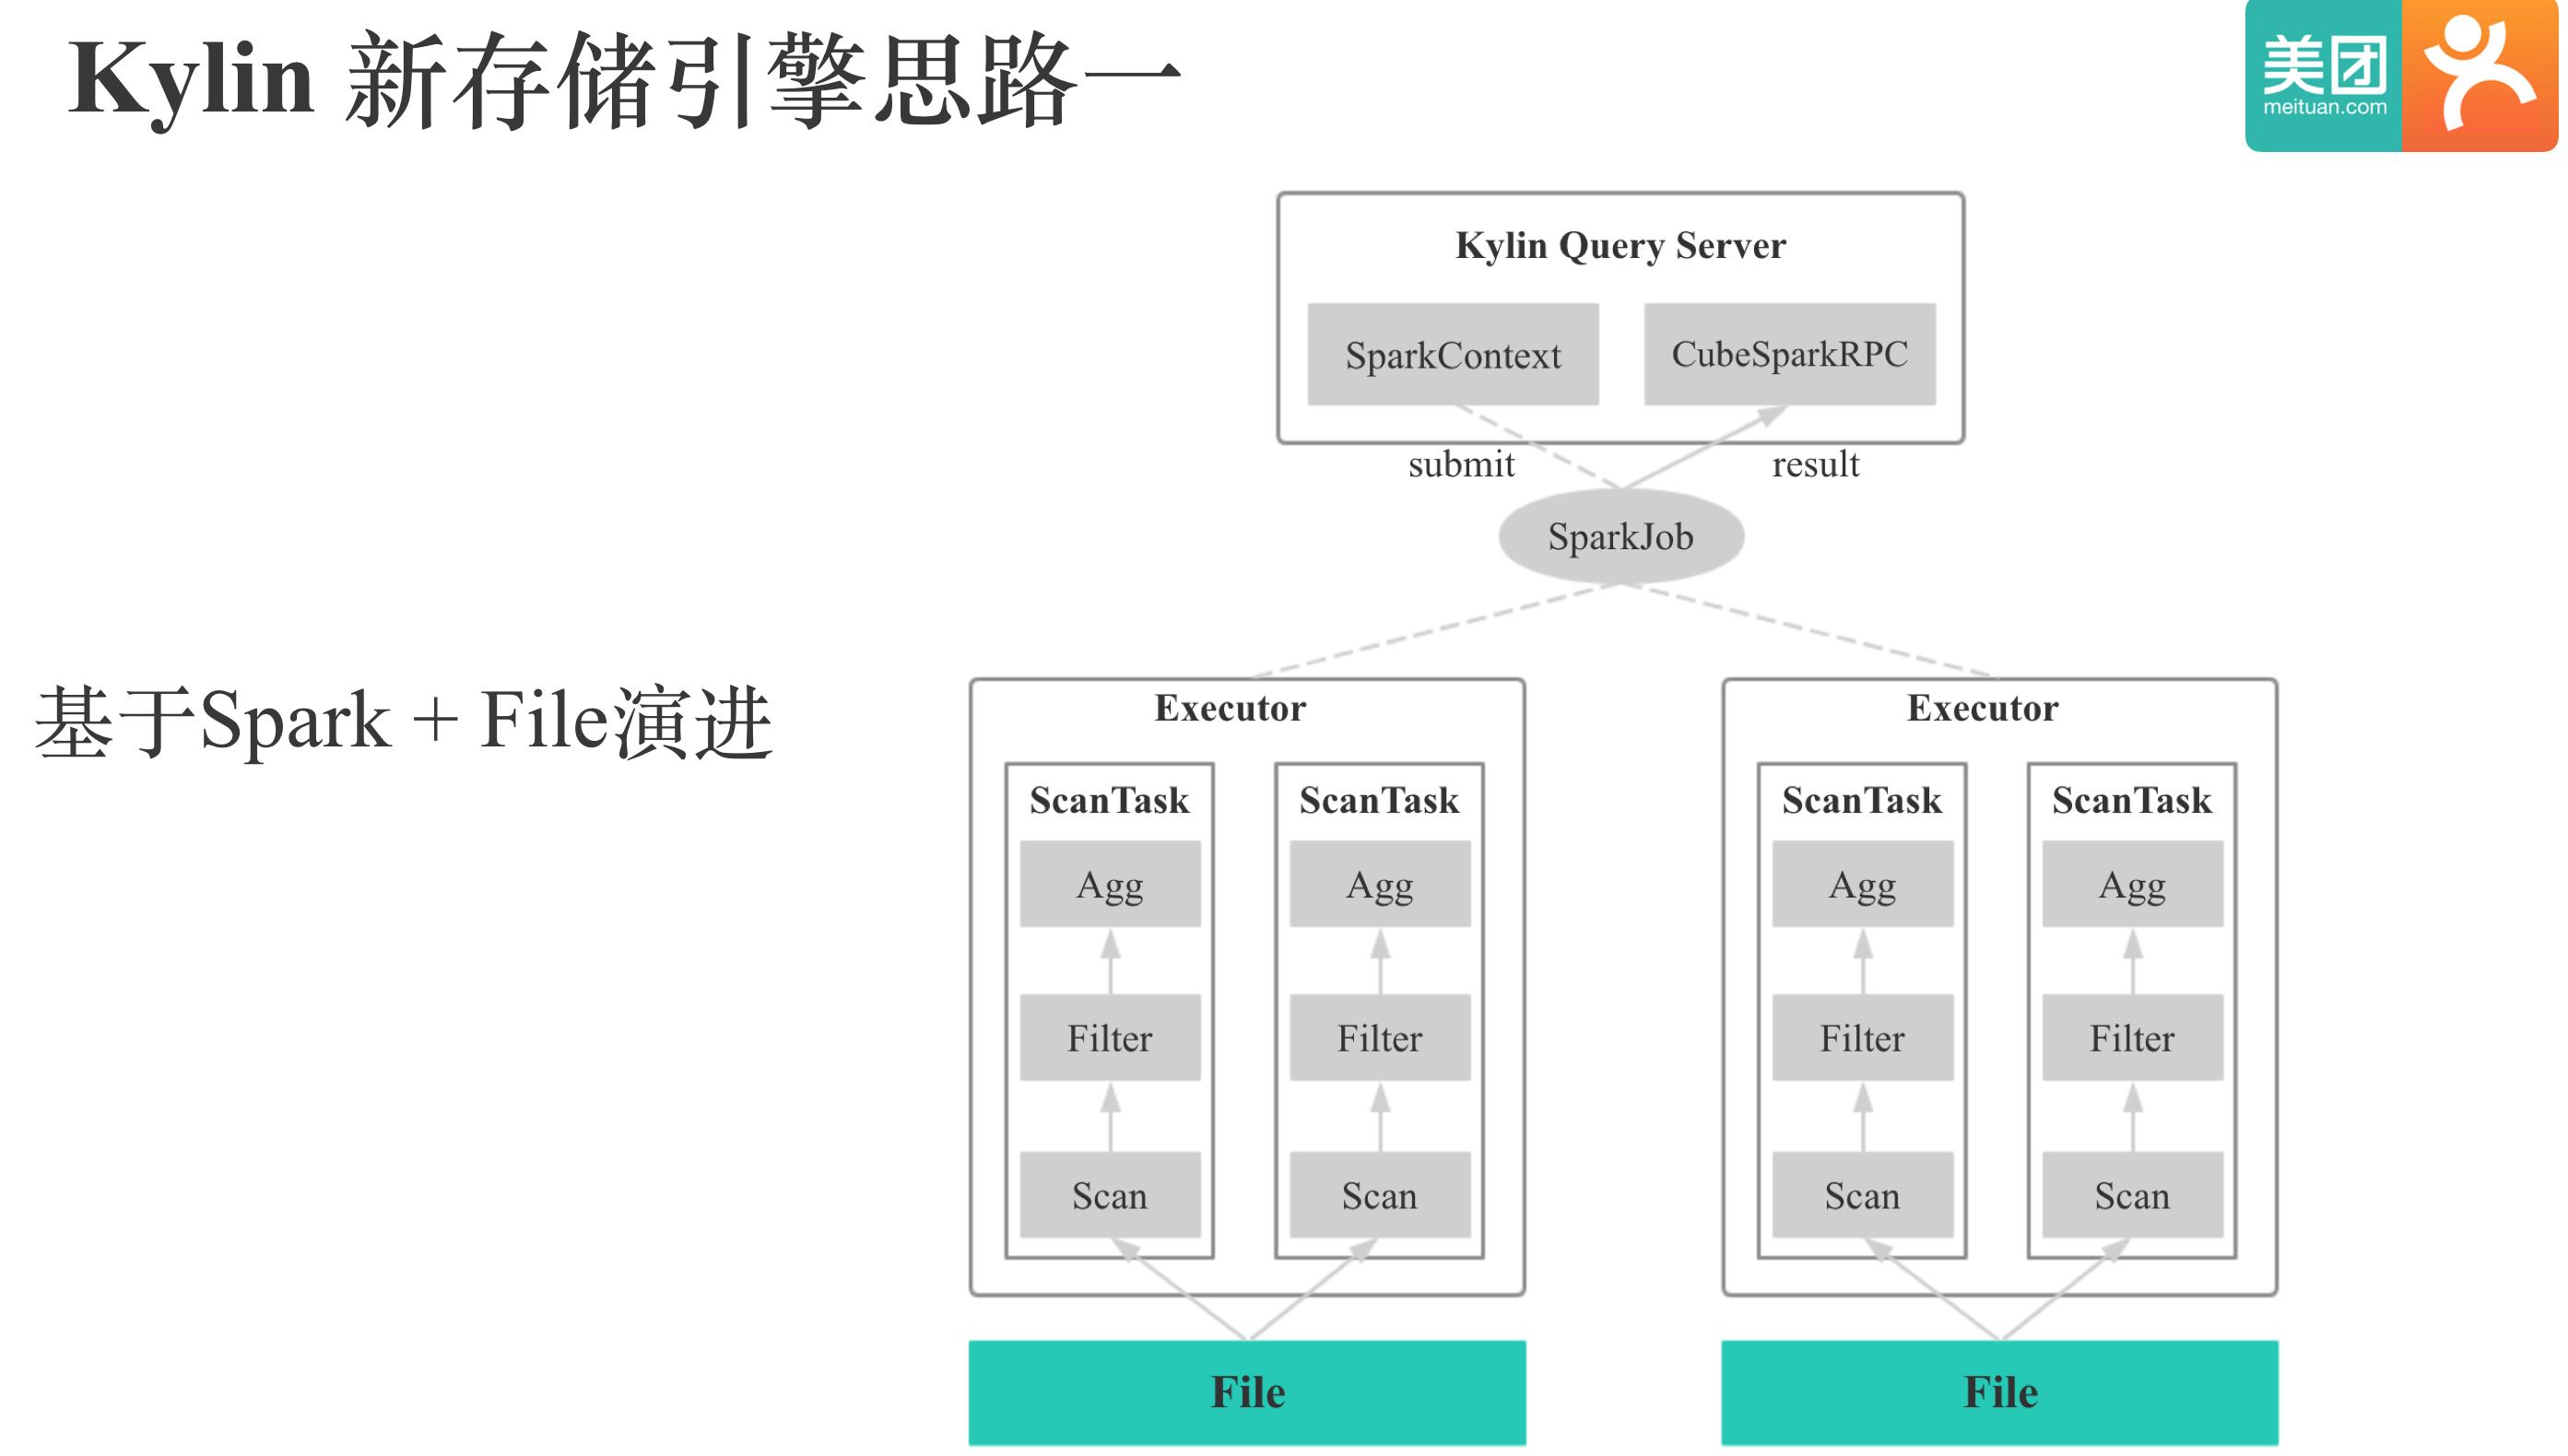 Kylin 新存储引擎实现思路